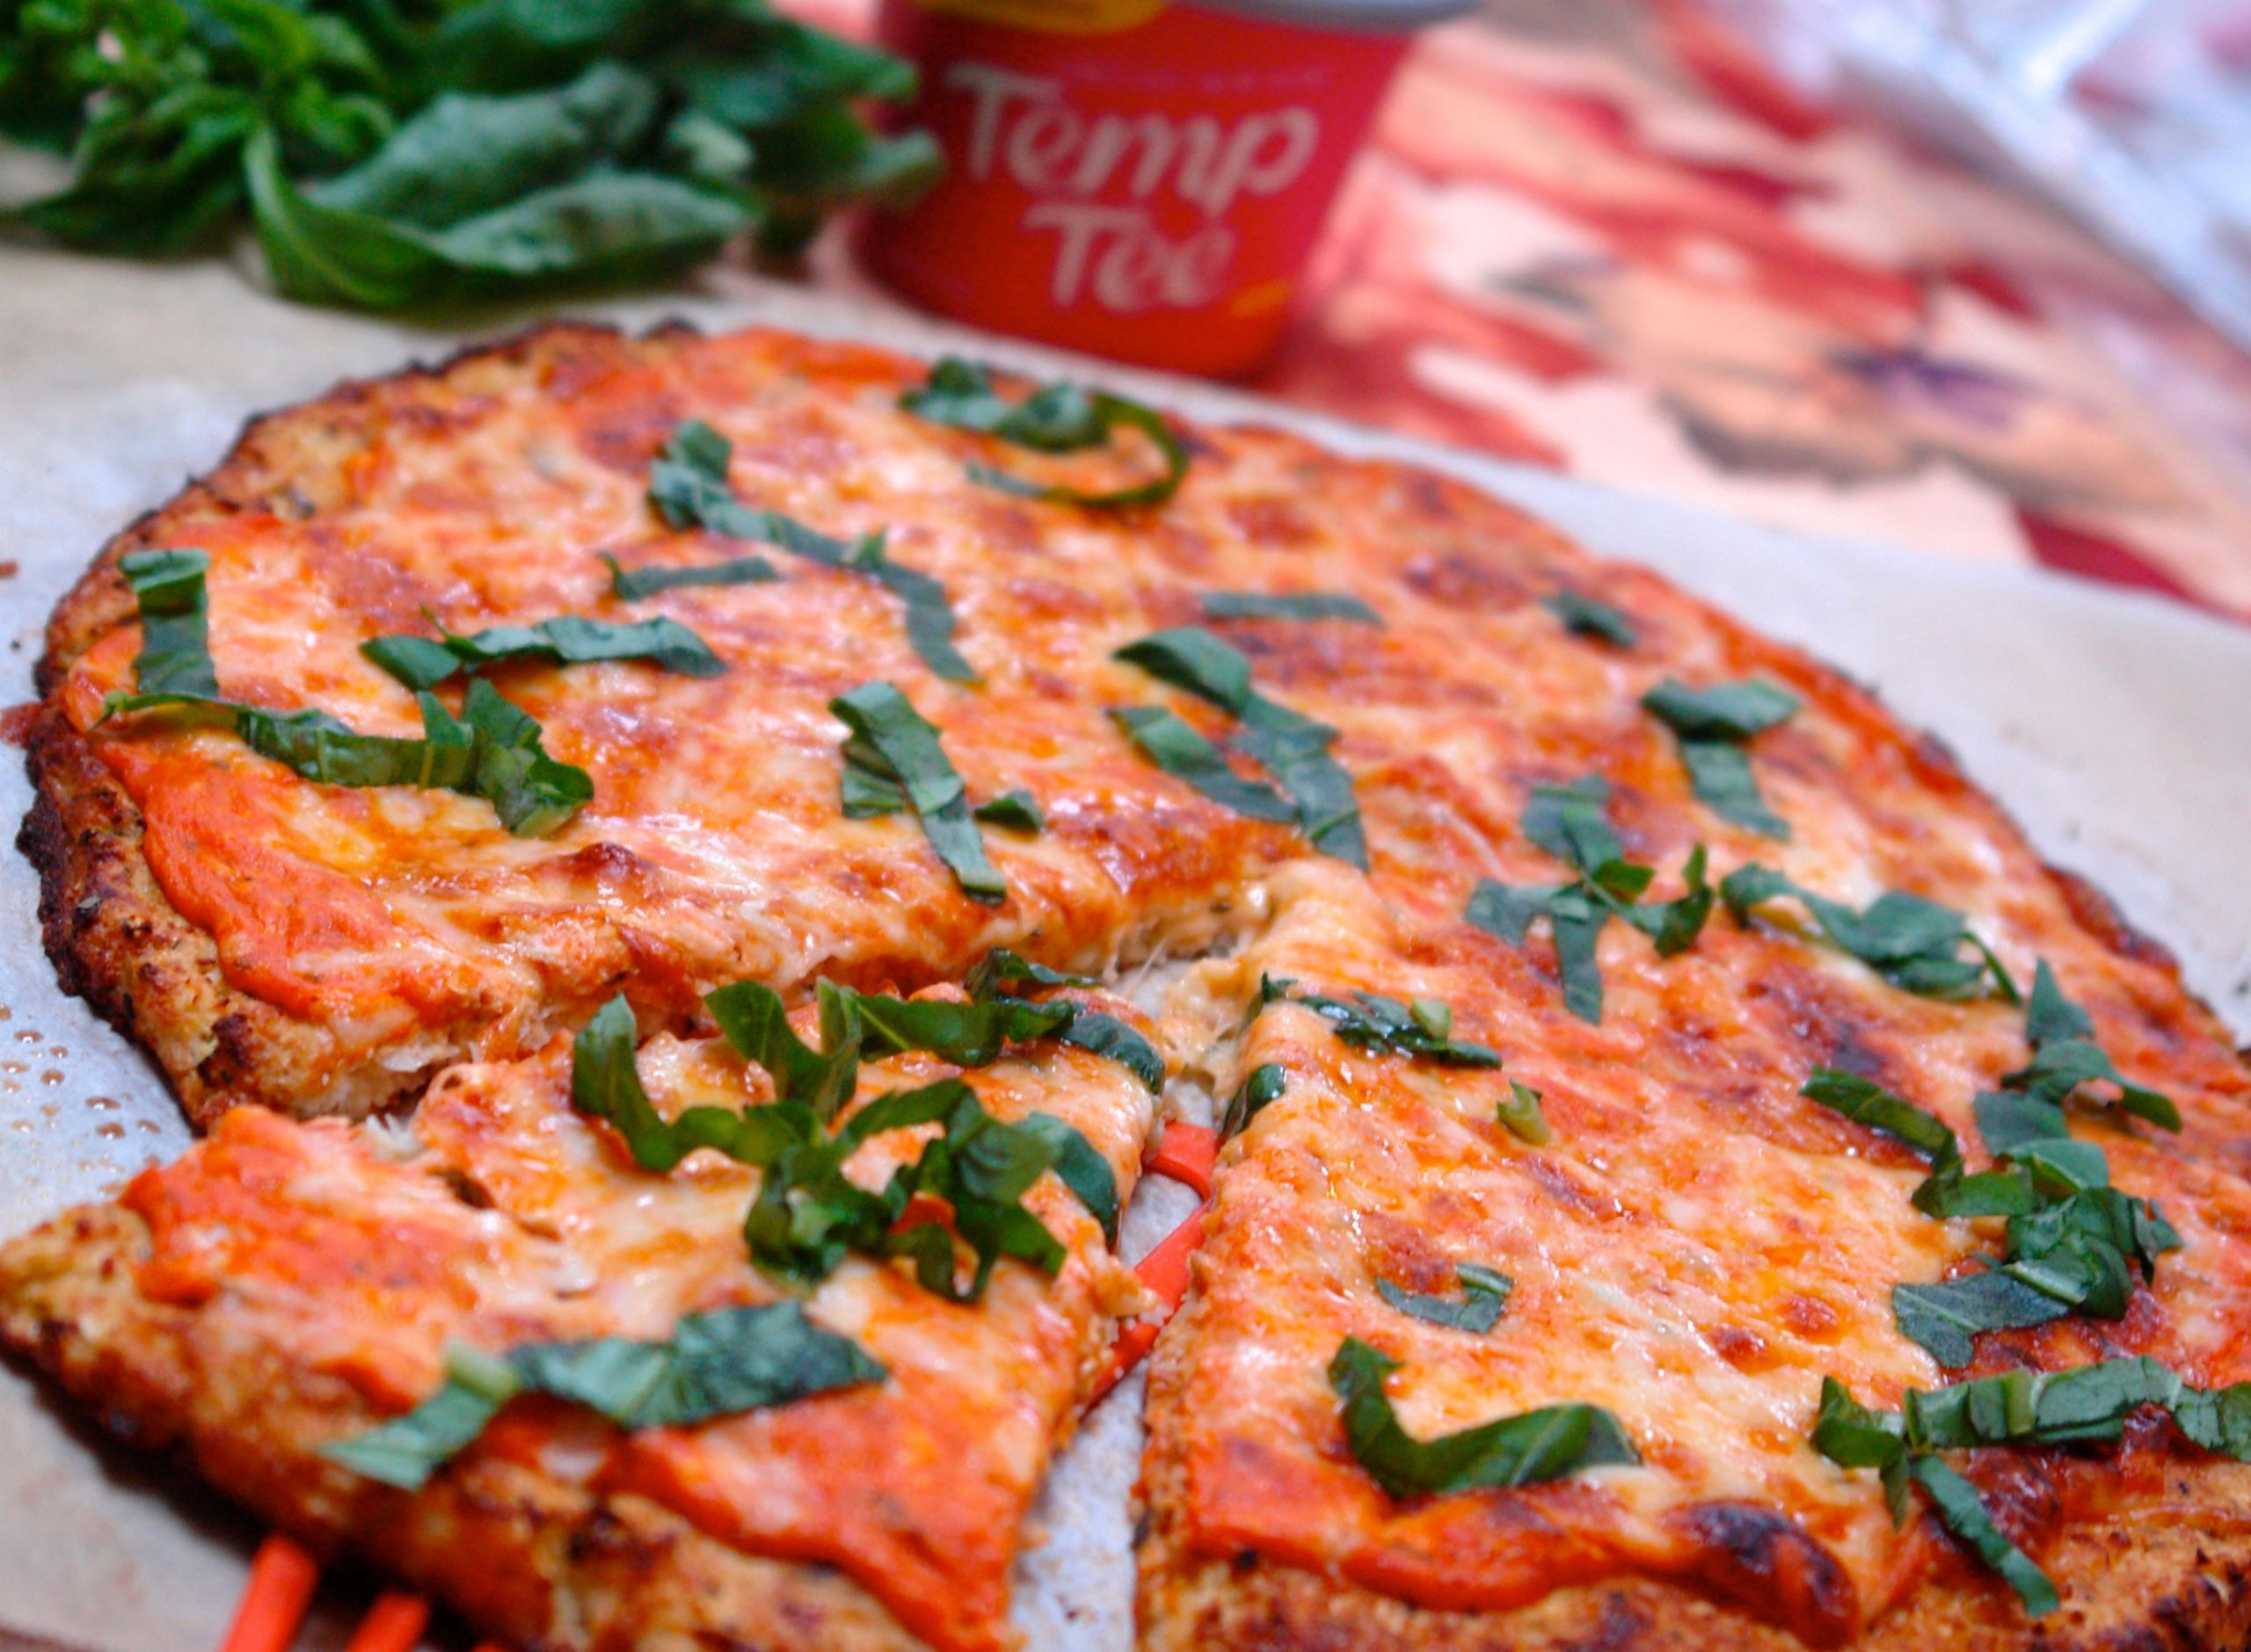 Cauliflower Pizza Crust Recipe Cauliflower Pizza Cauliflower Pizza Crust Recipe Cauliflower Crust Pizza